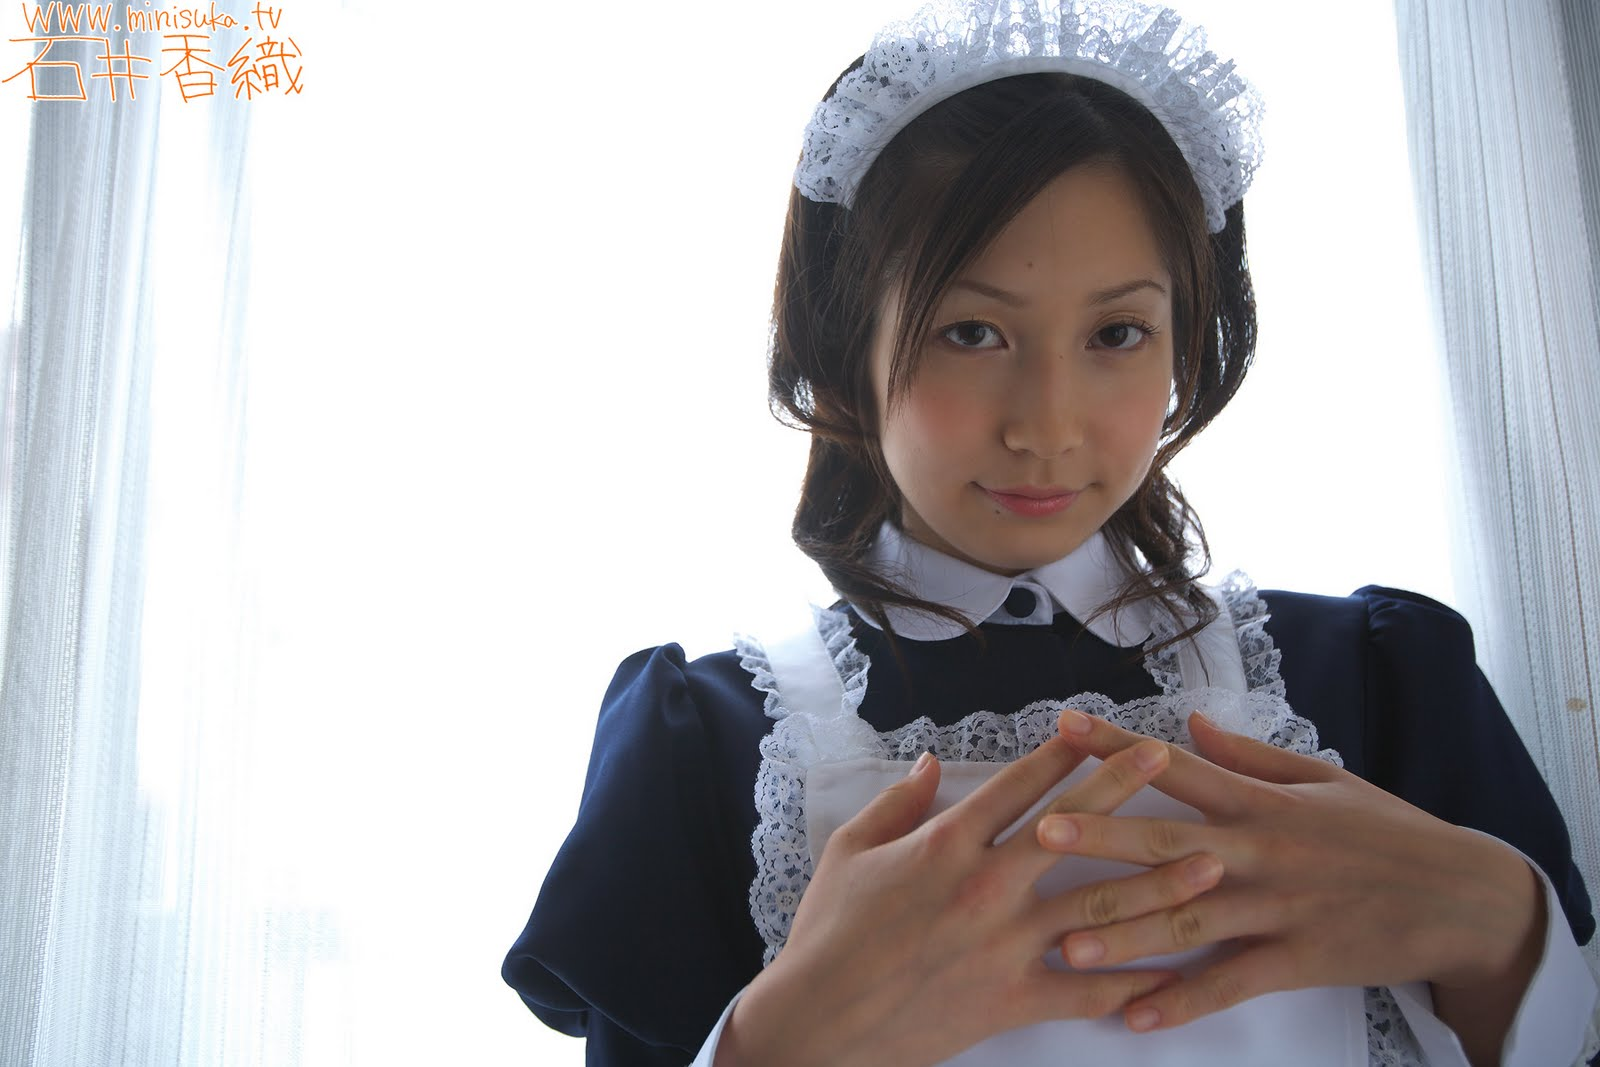 Kaori Ishii As Cutest Maid